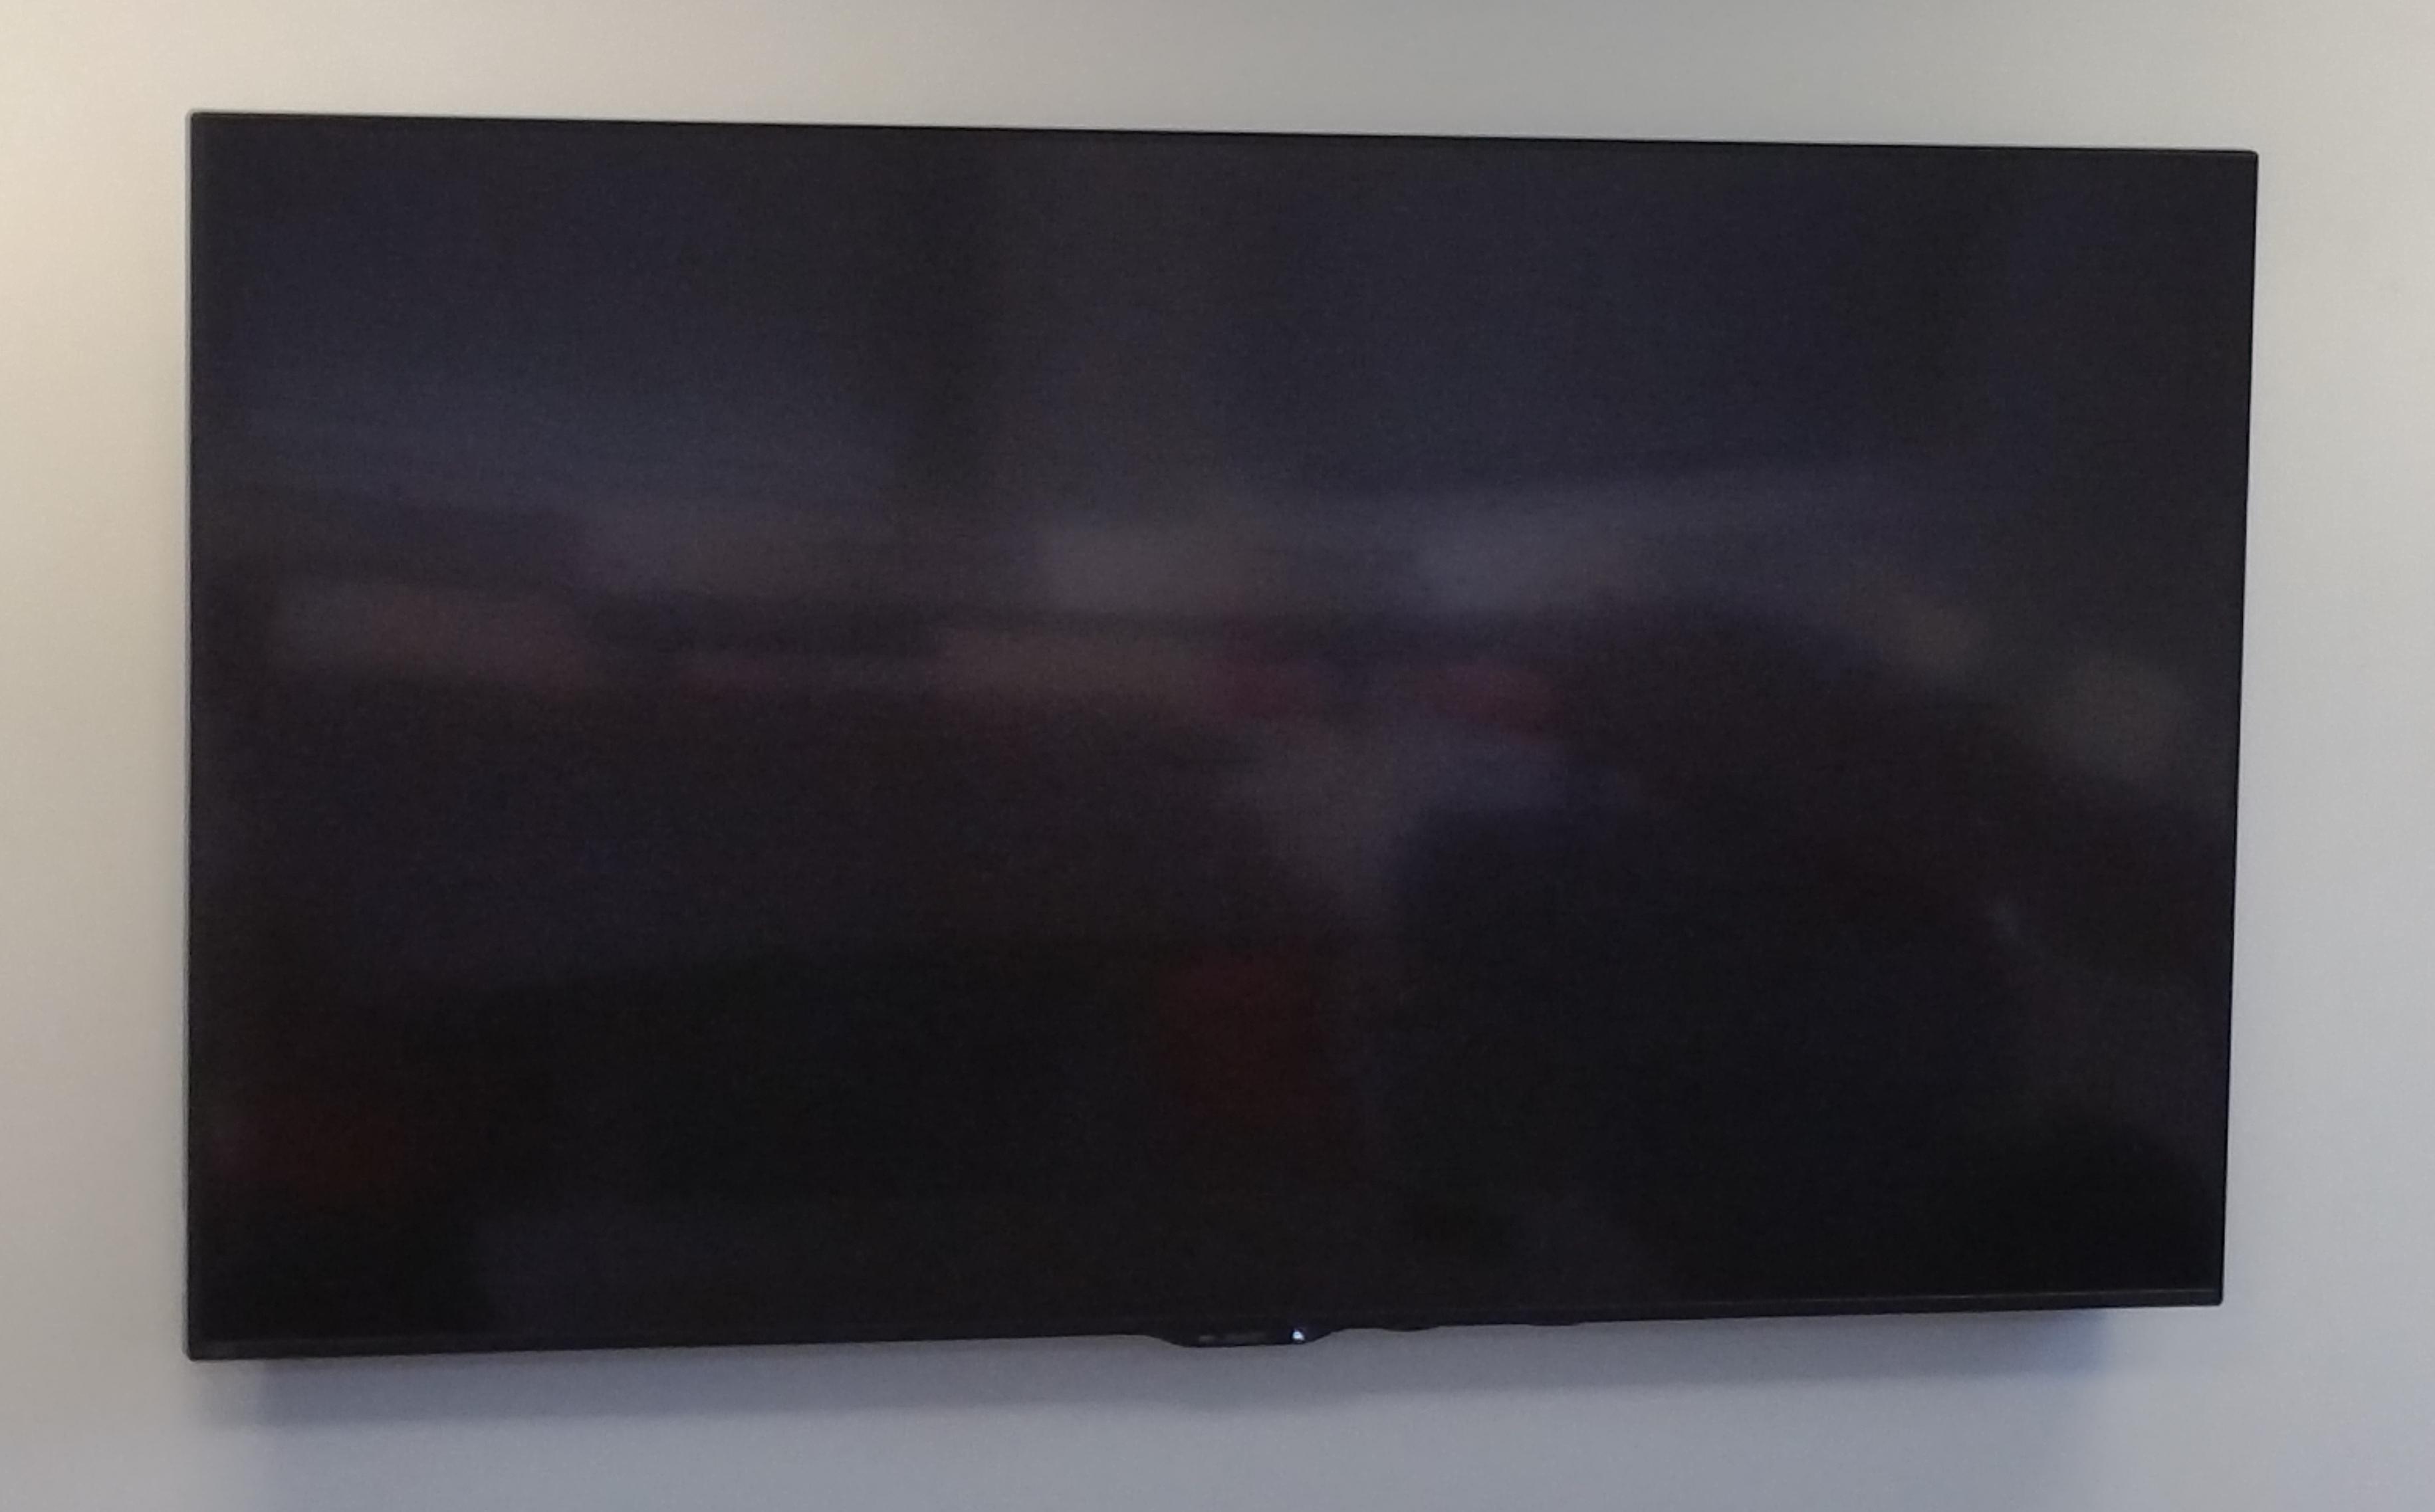 Photo of TV in Carlton 119